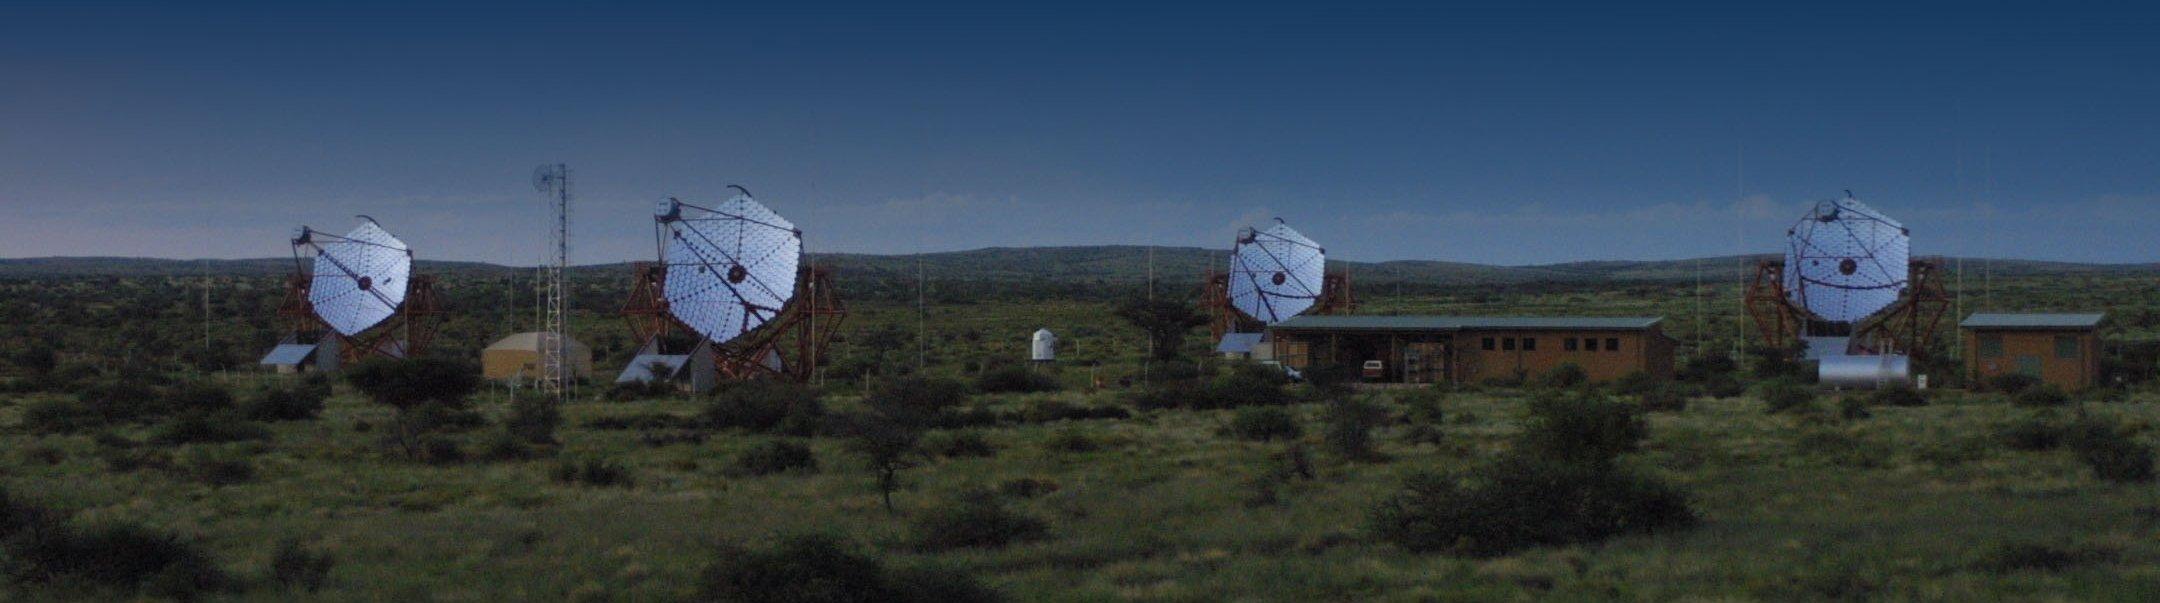 H.E.S.S. telescopes